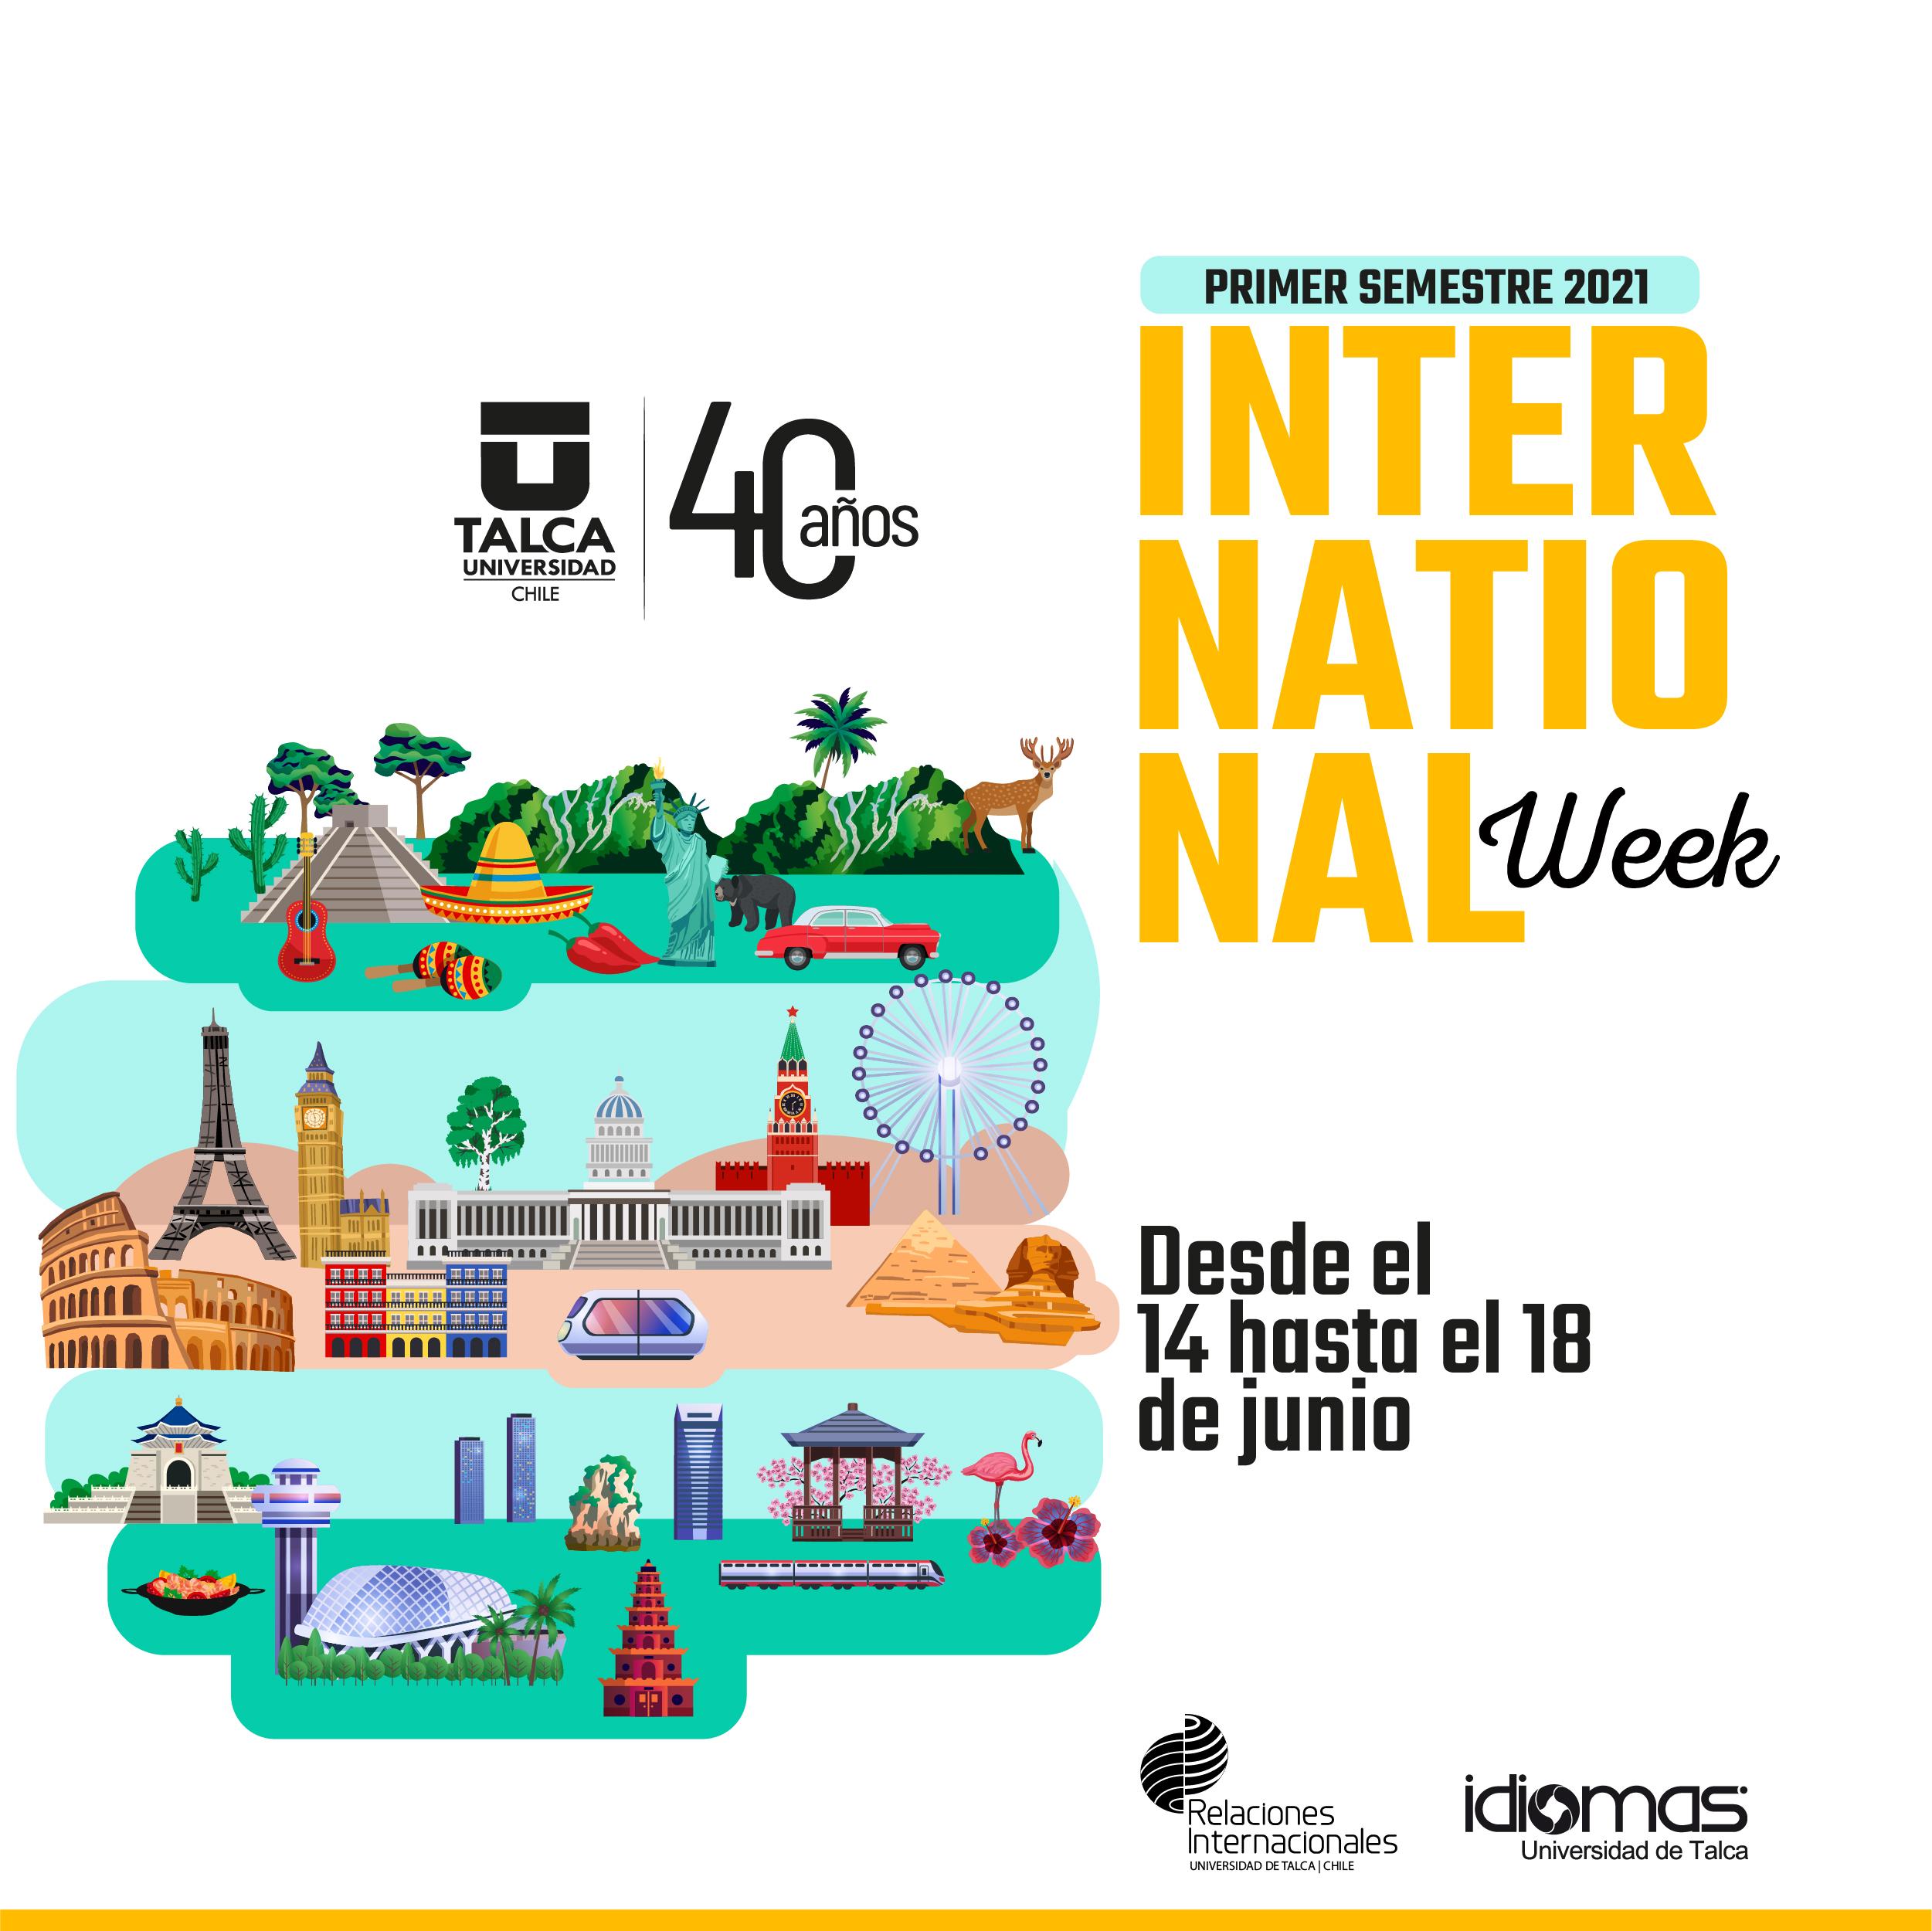 International Week, Primer Semestre 2021